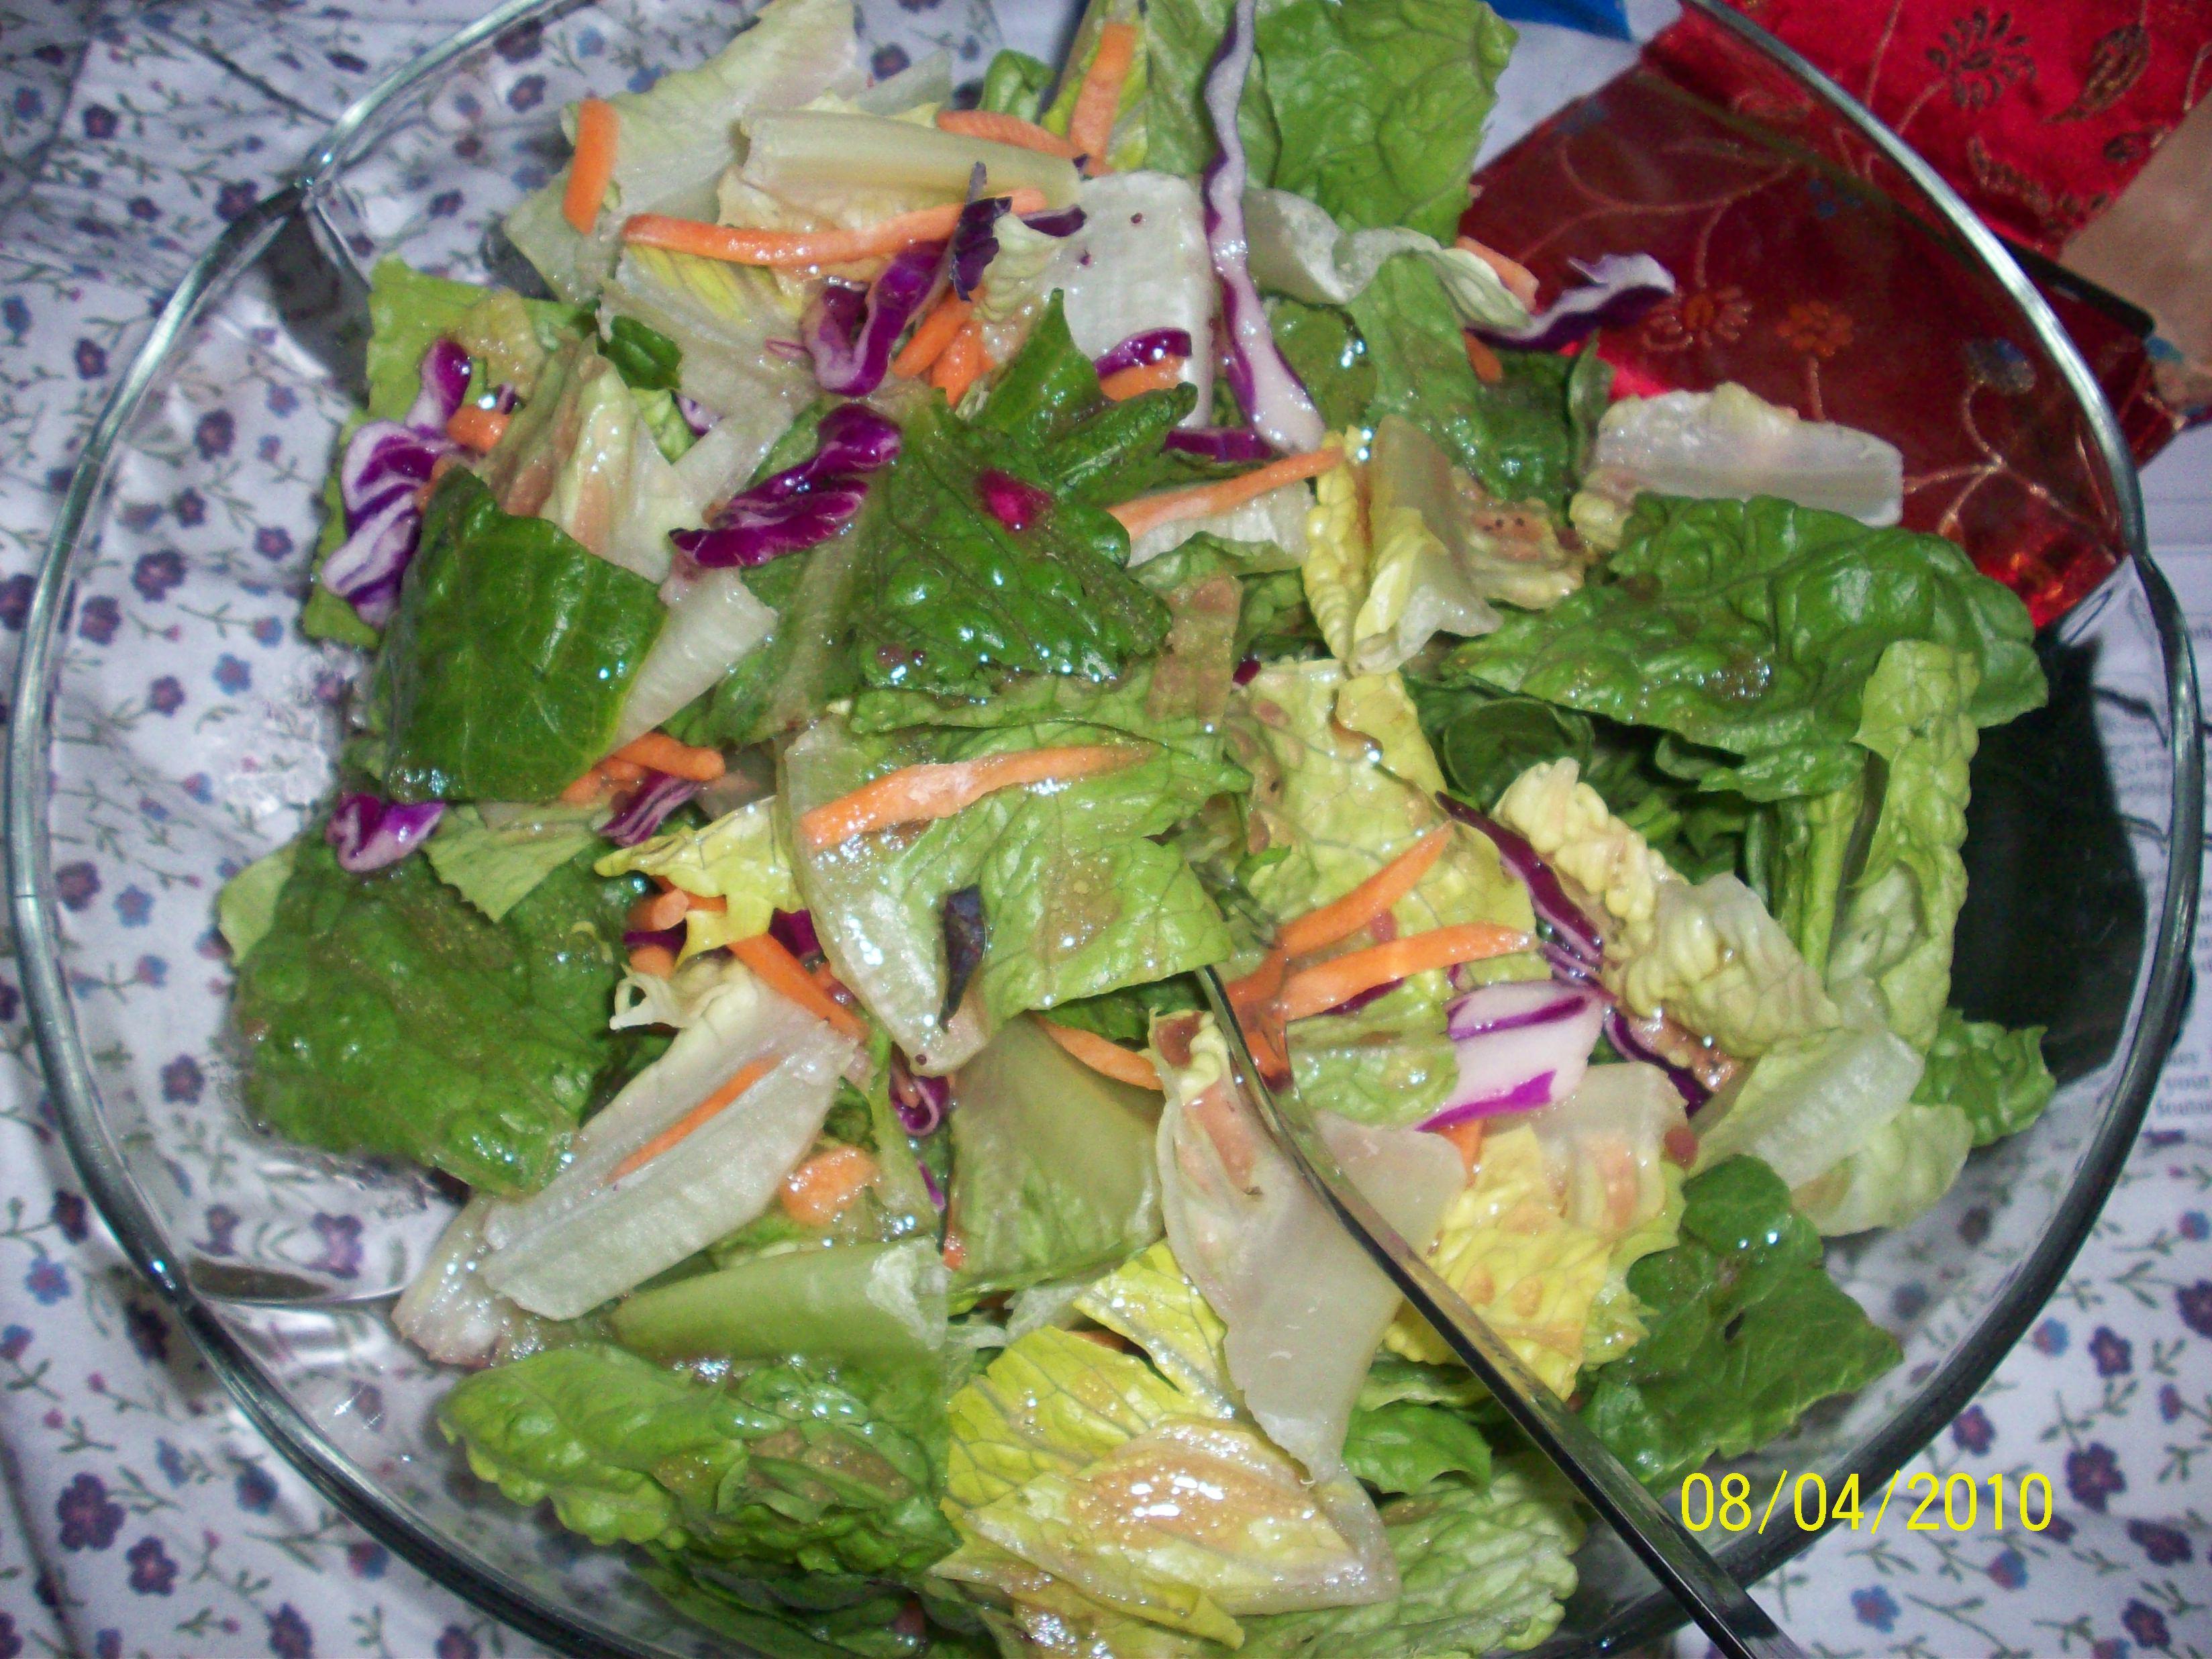 http://foodloader.net/cutie_2010-04-08_Salad.jpg